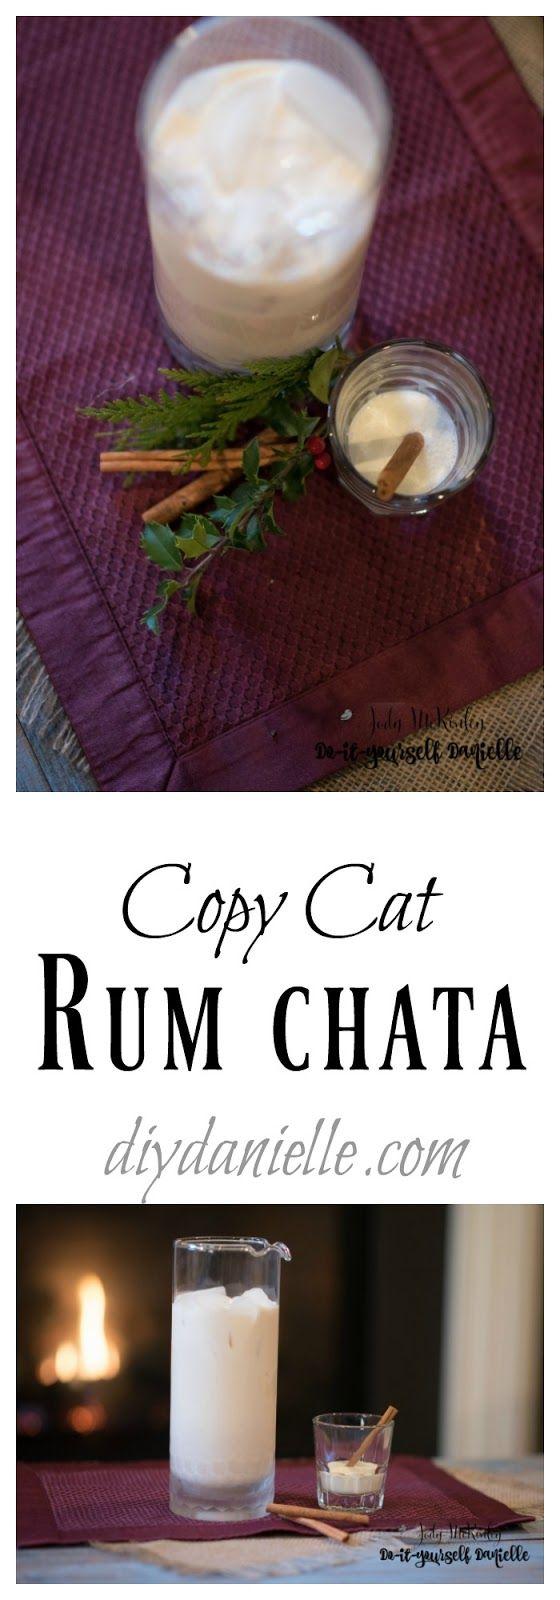 Copycat Rum Chata - DIY Danielle #easymixeddrinkrecipes